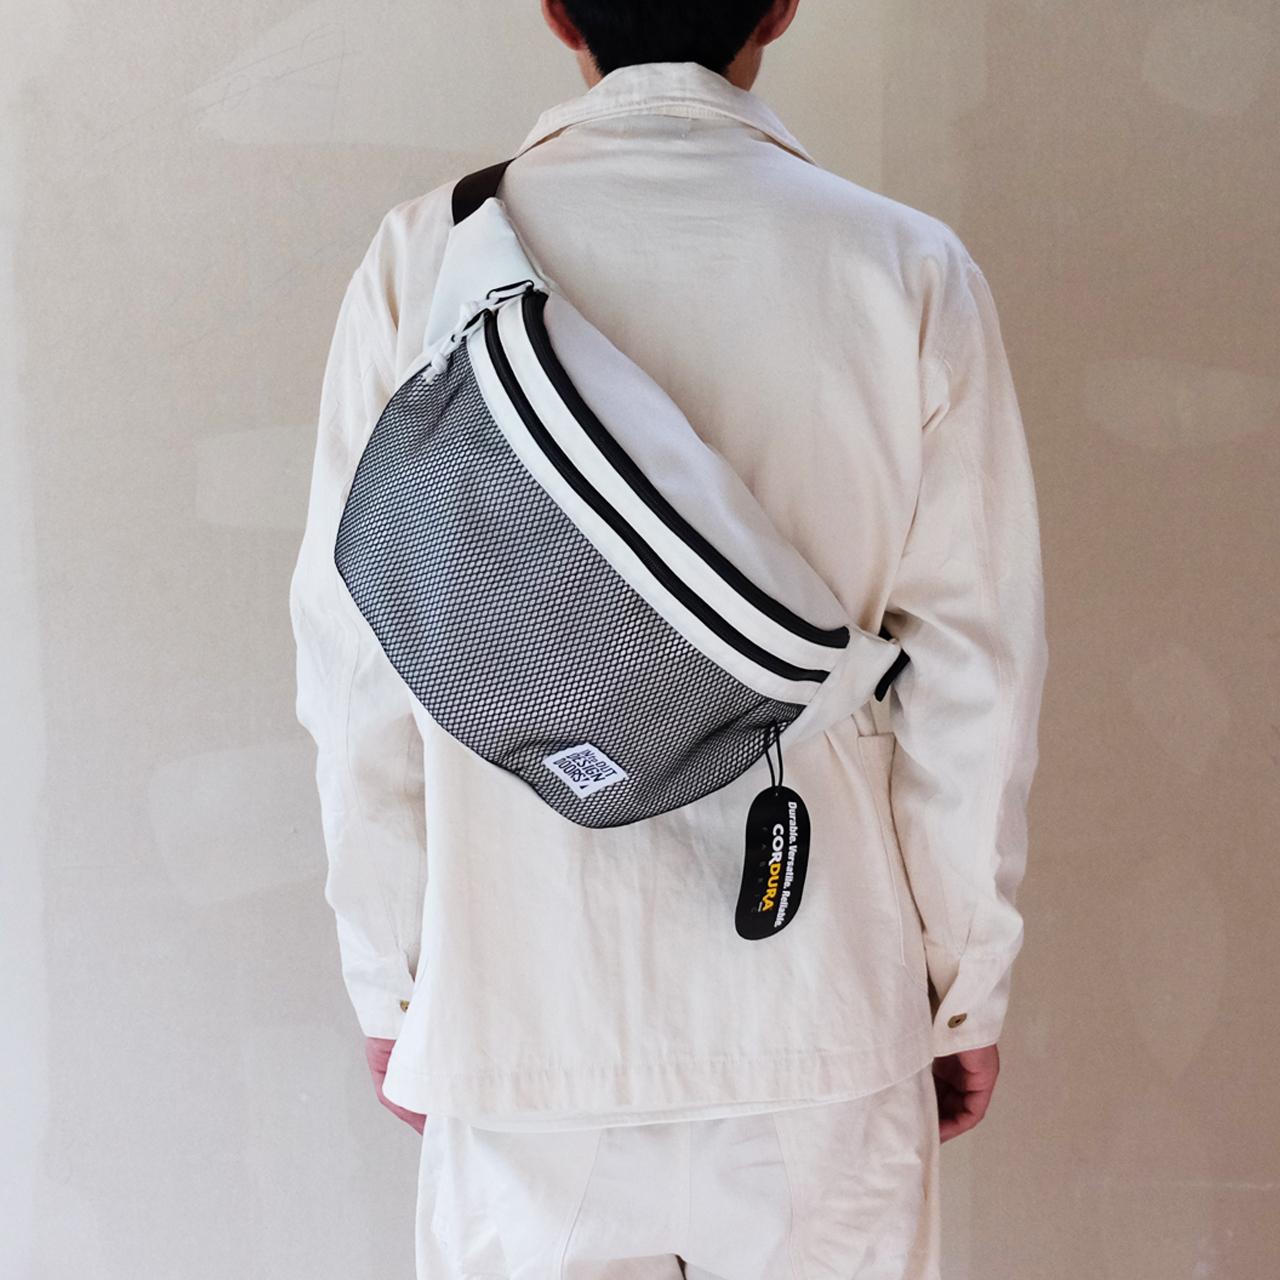 doors yamazoe chalk bag large